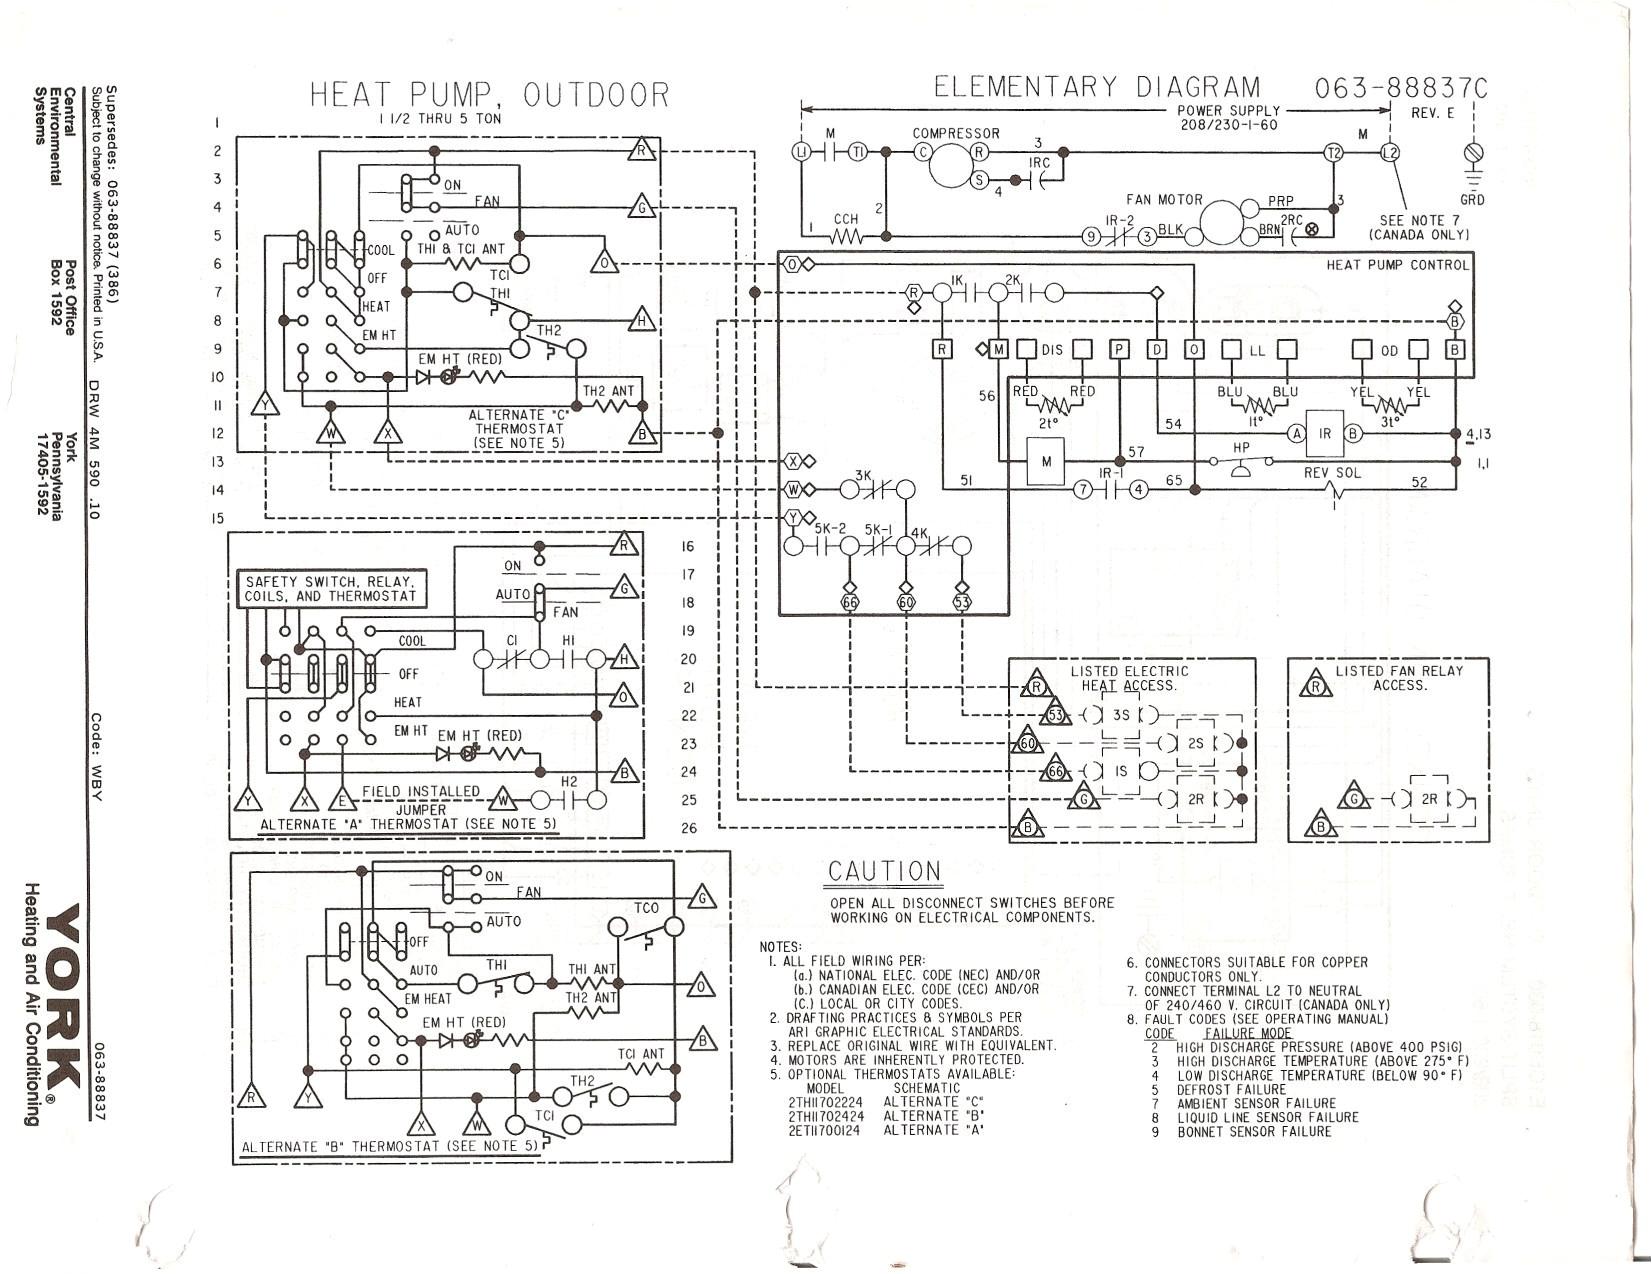 york wiring diagrams wiring diagram schematic york air conditioner remote manual york ac schematics wiring diagram